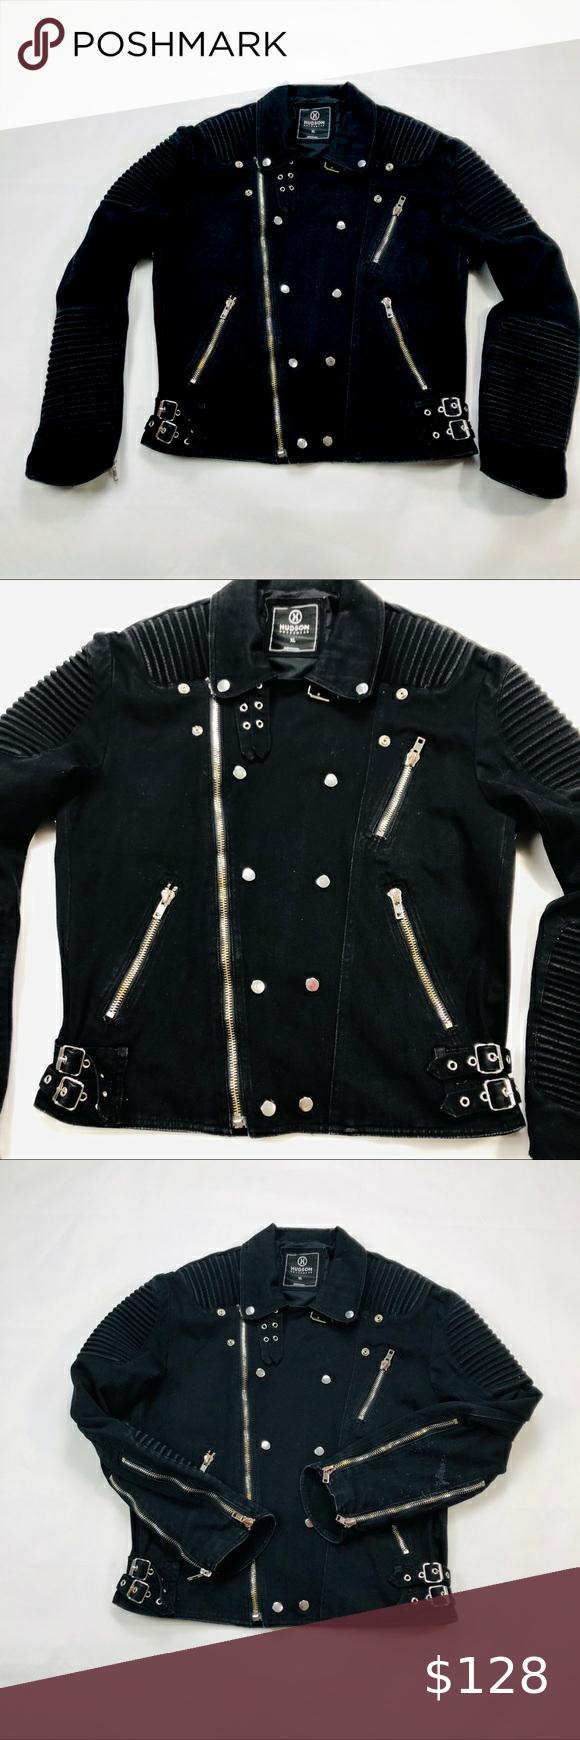 Men S Hudson Biker Jacket Size Xl Hudson Outerwear 100 Authentic Mens Biker Zip Jacket Black Size Xl Zipper On Biker Jacket Black Denim Jacket Hudson Denim [ 1740 x 580 Pixel ]